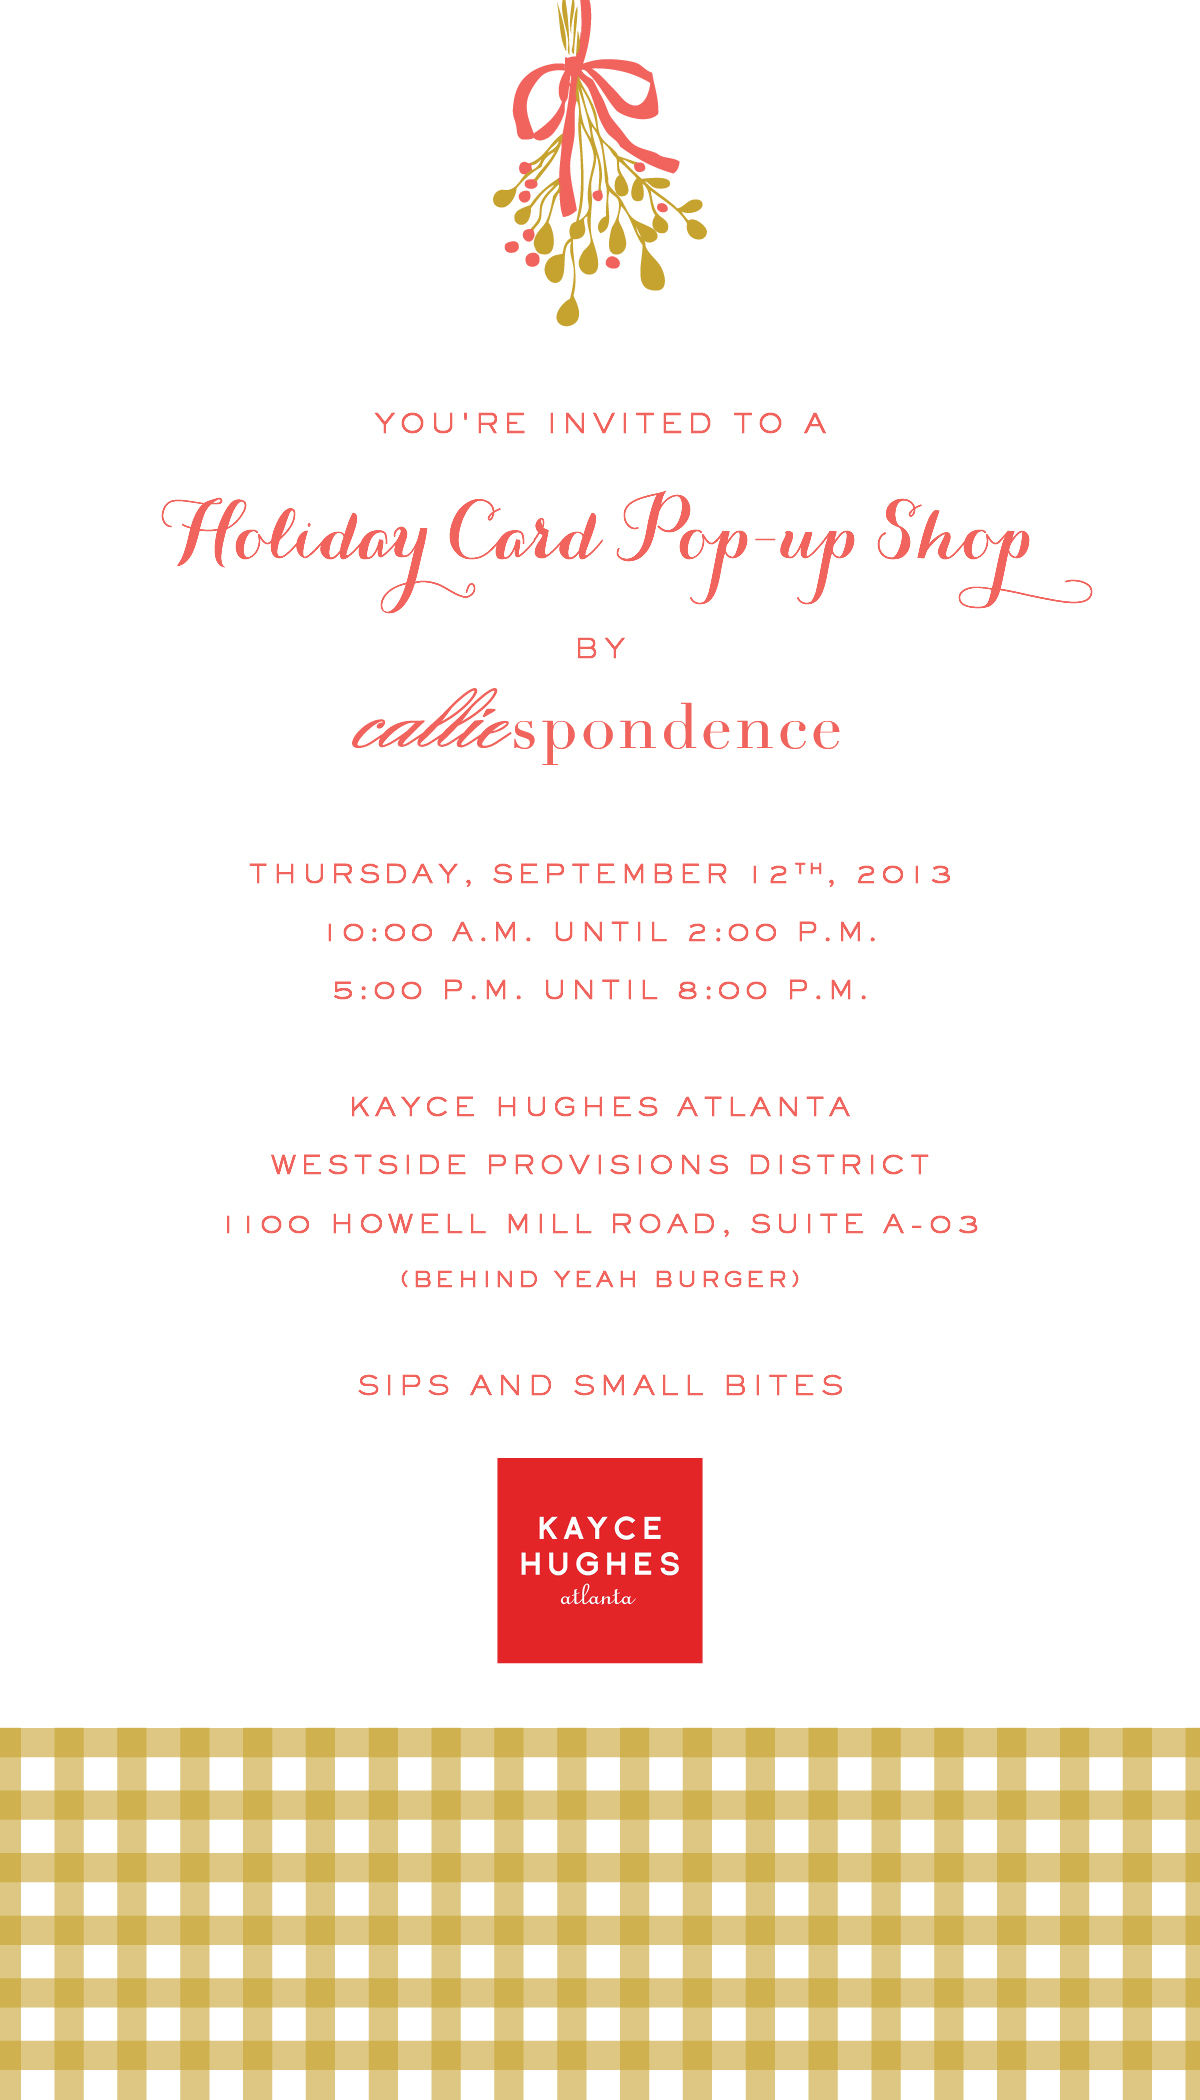 holiday card pop up shop – thursday, september 12th | Calliespondence